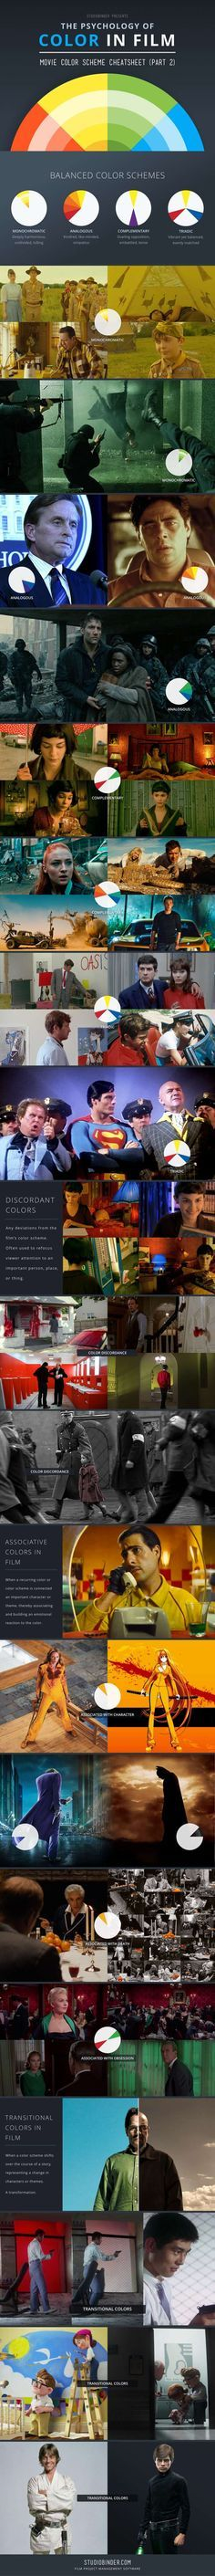 The Movie Color Scheme Cheatsheet by StudioBinder